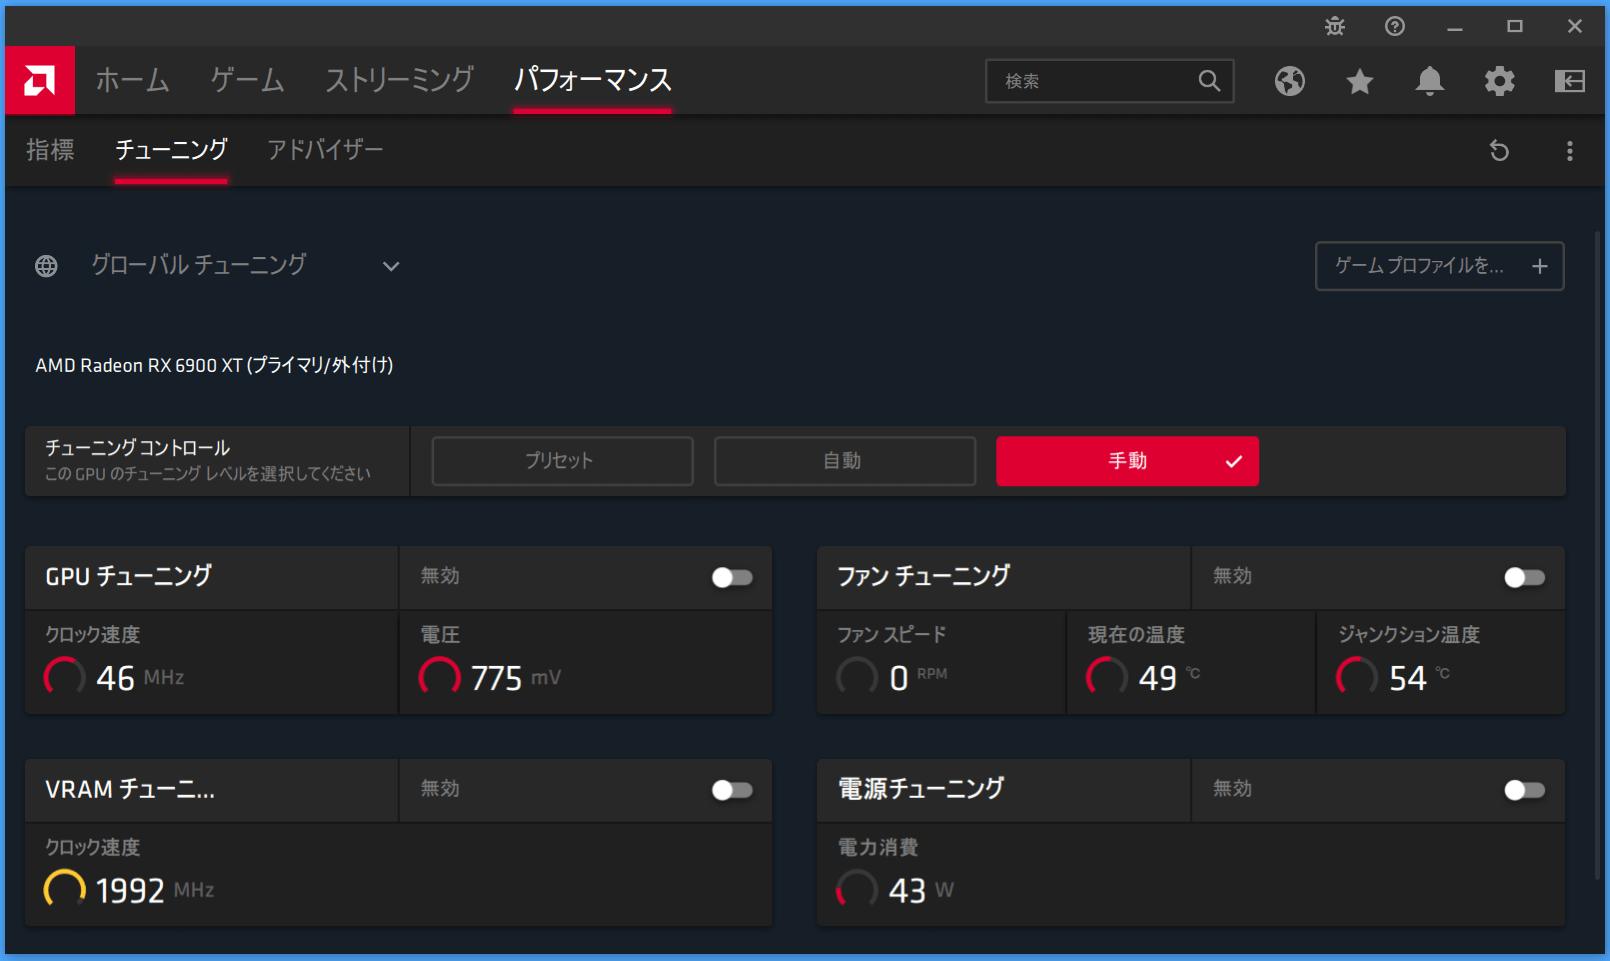 Radeon RX 6900 XT_Radeon-Setting_3